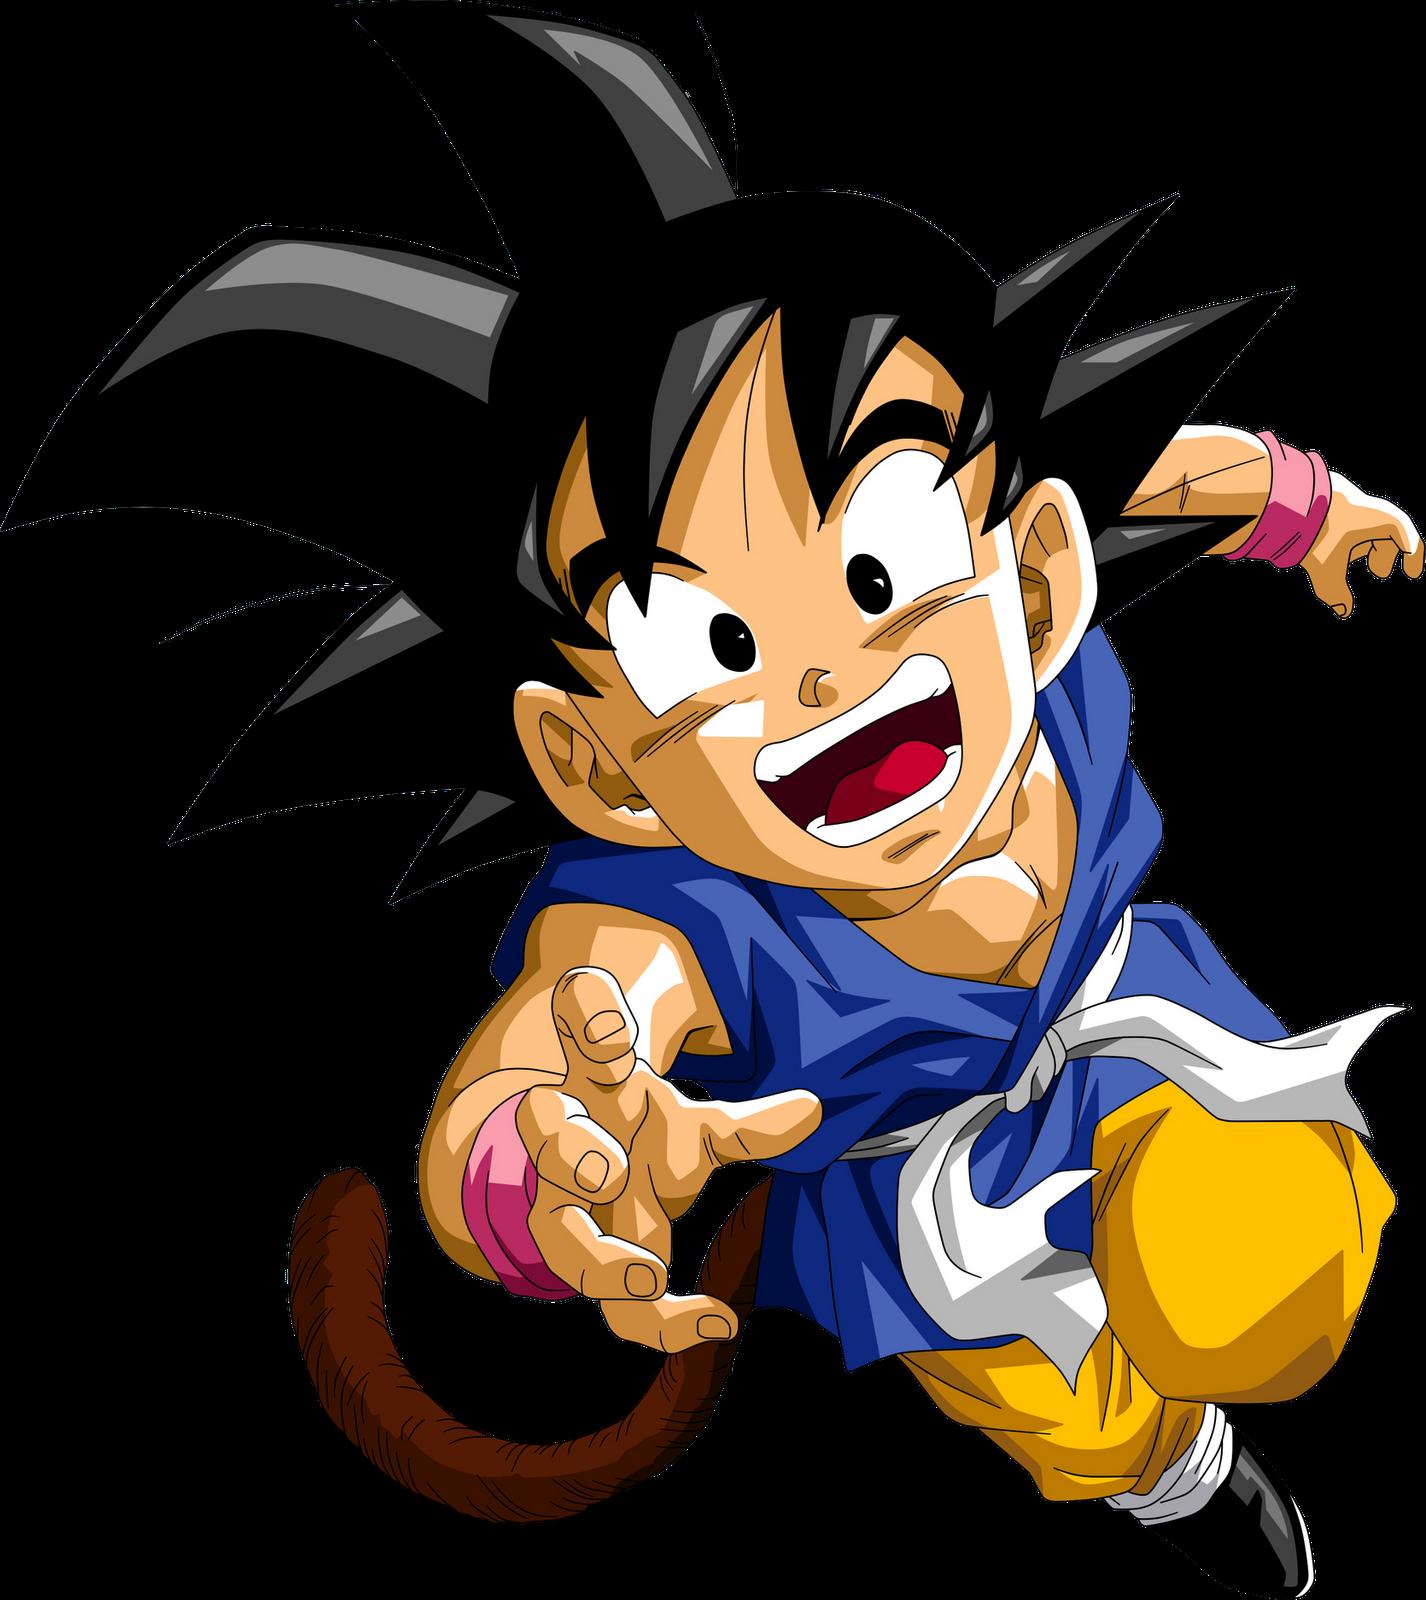 Image Render Dragon Ball Kid Goku Cartoon Hd Wallpaper Iphone 6